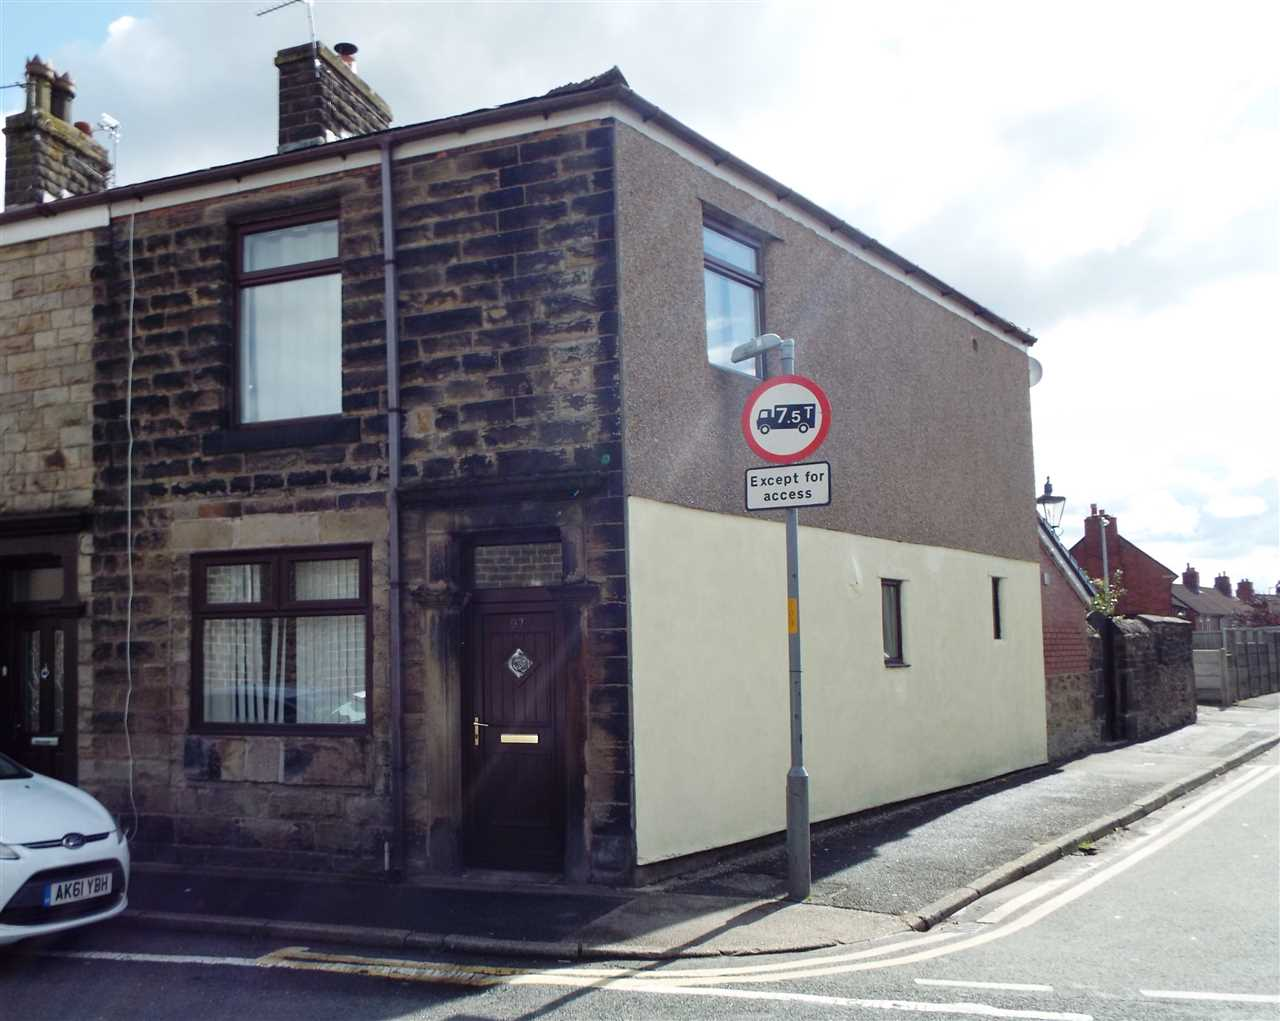 3 bed end of terrace for sale in Park Road, Adlington, Adlington - Property Image 1